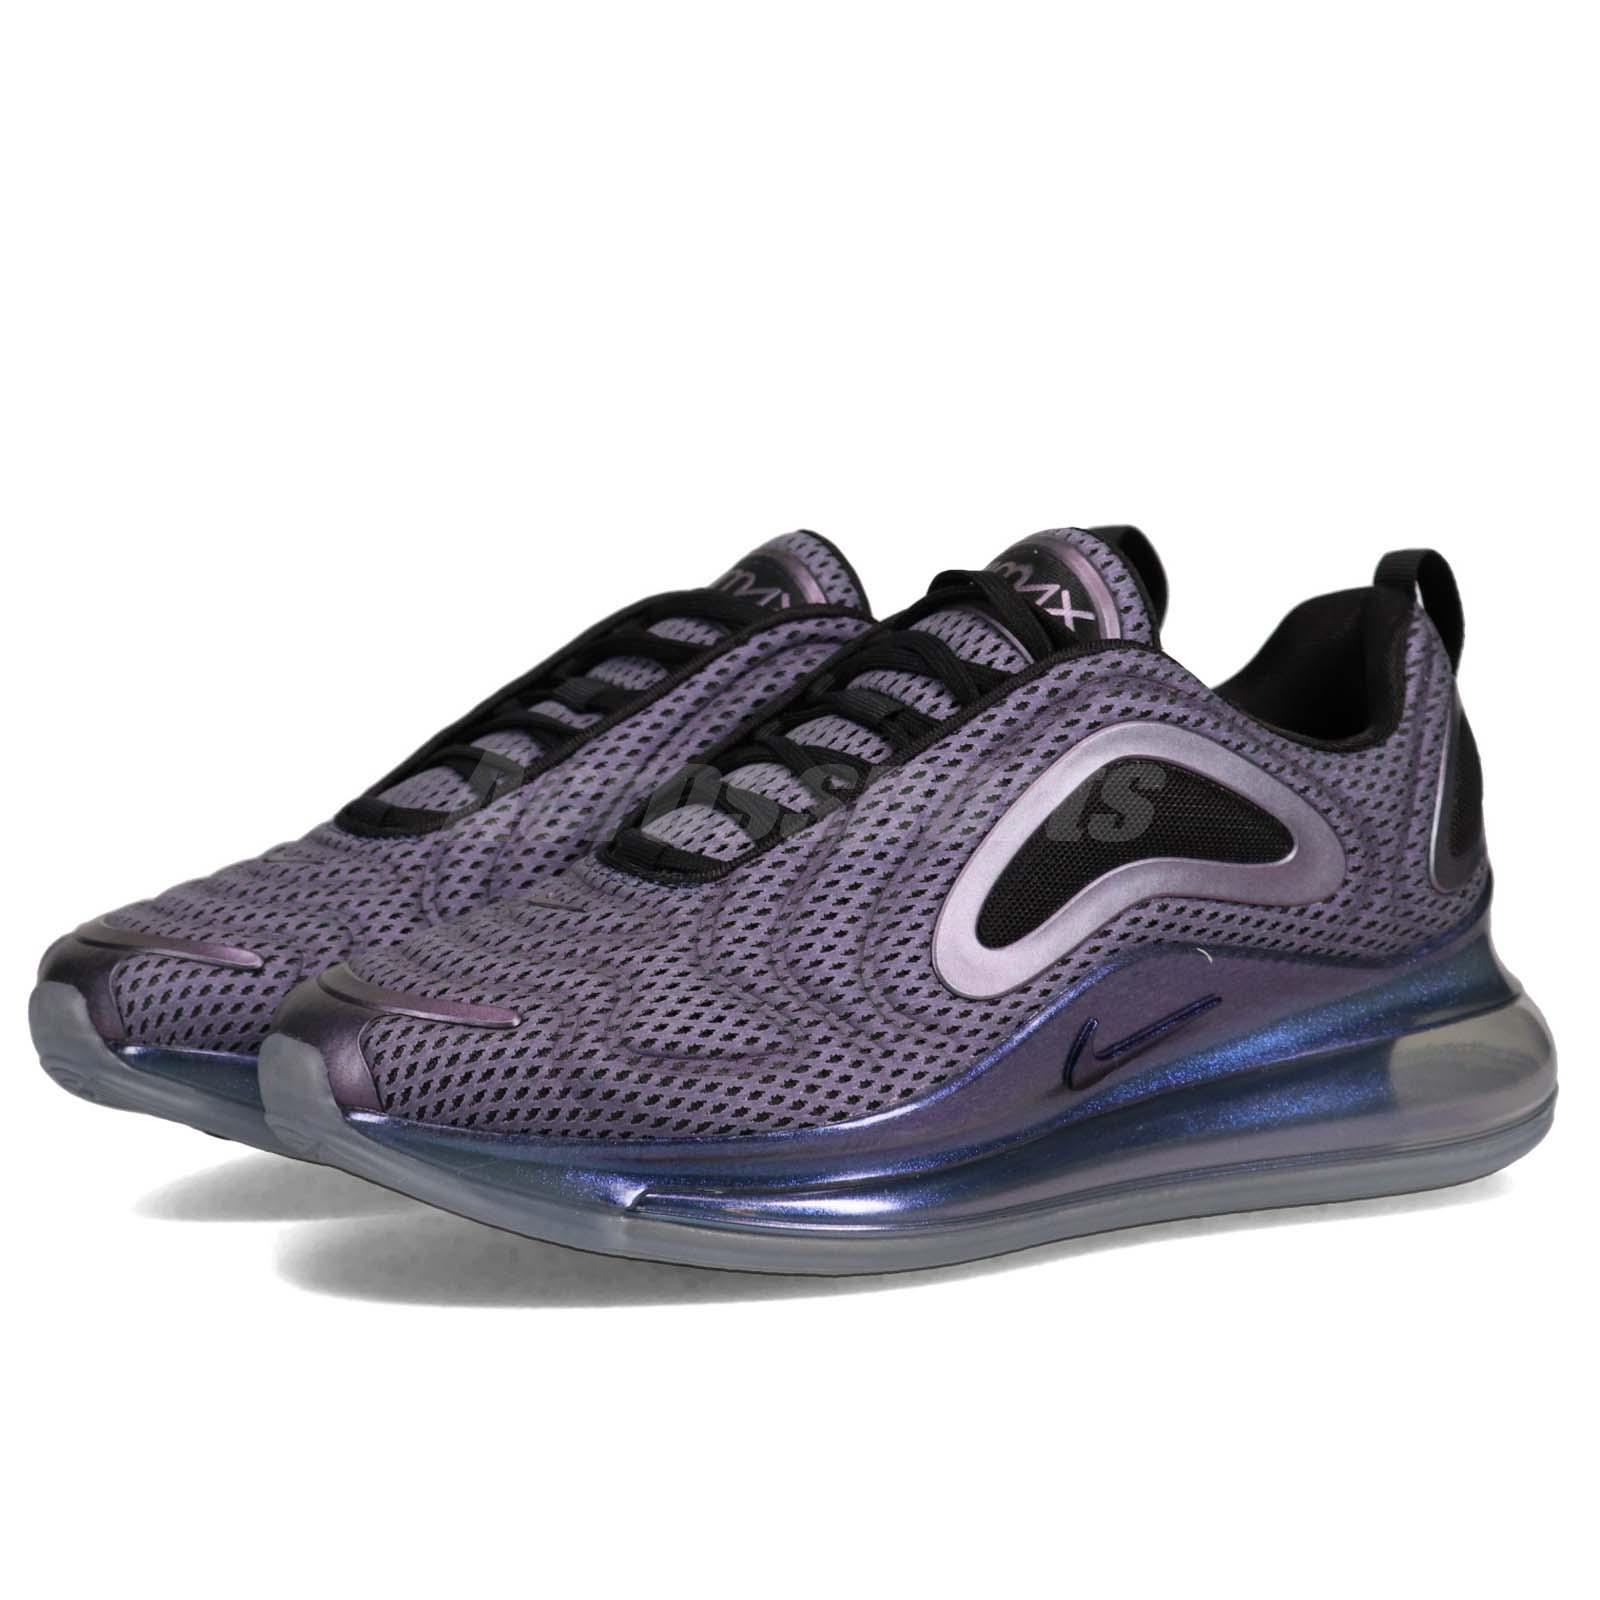 Mens Nike Air Max 720 Athletic Sneakers Black silver NIKE ND009134